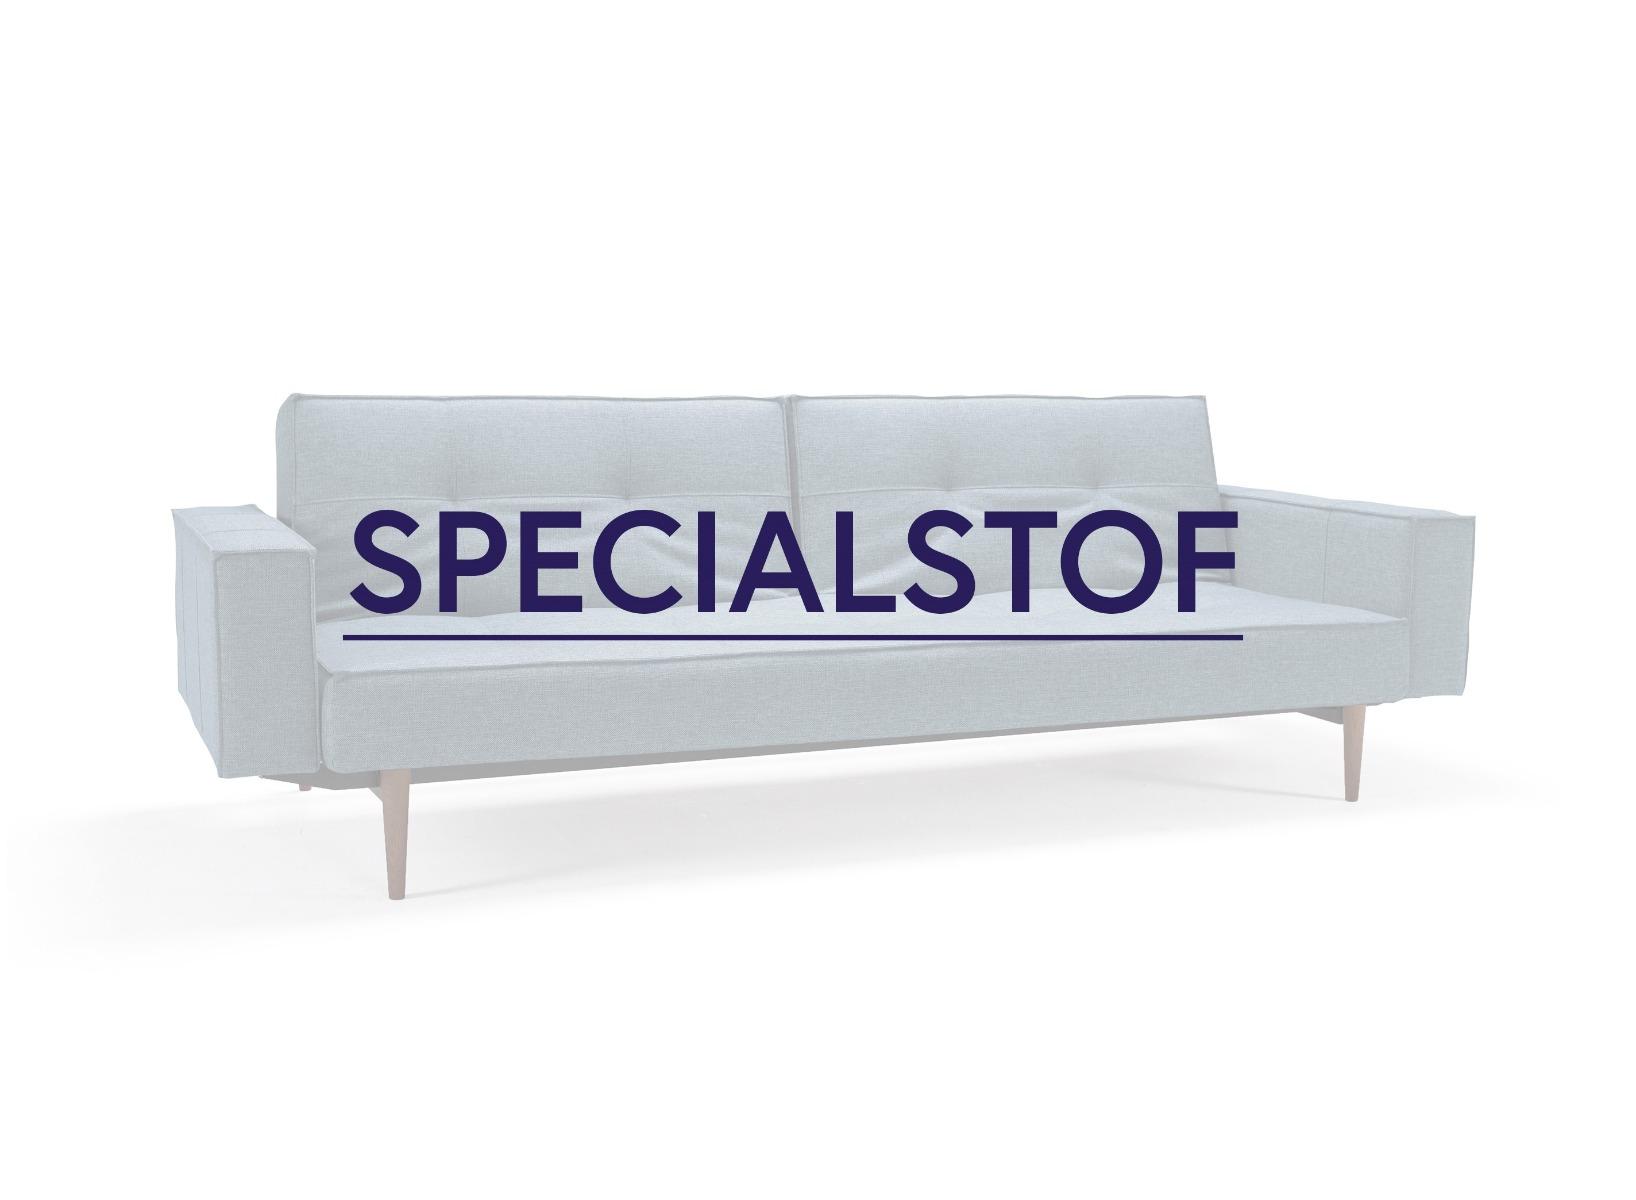 Splitback Styletto Specialstof